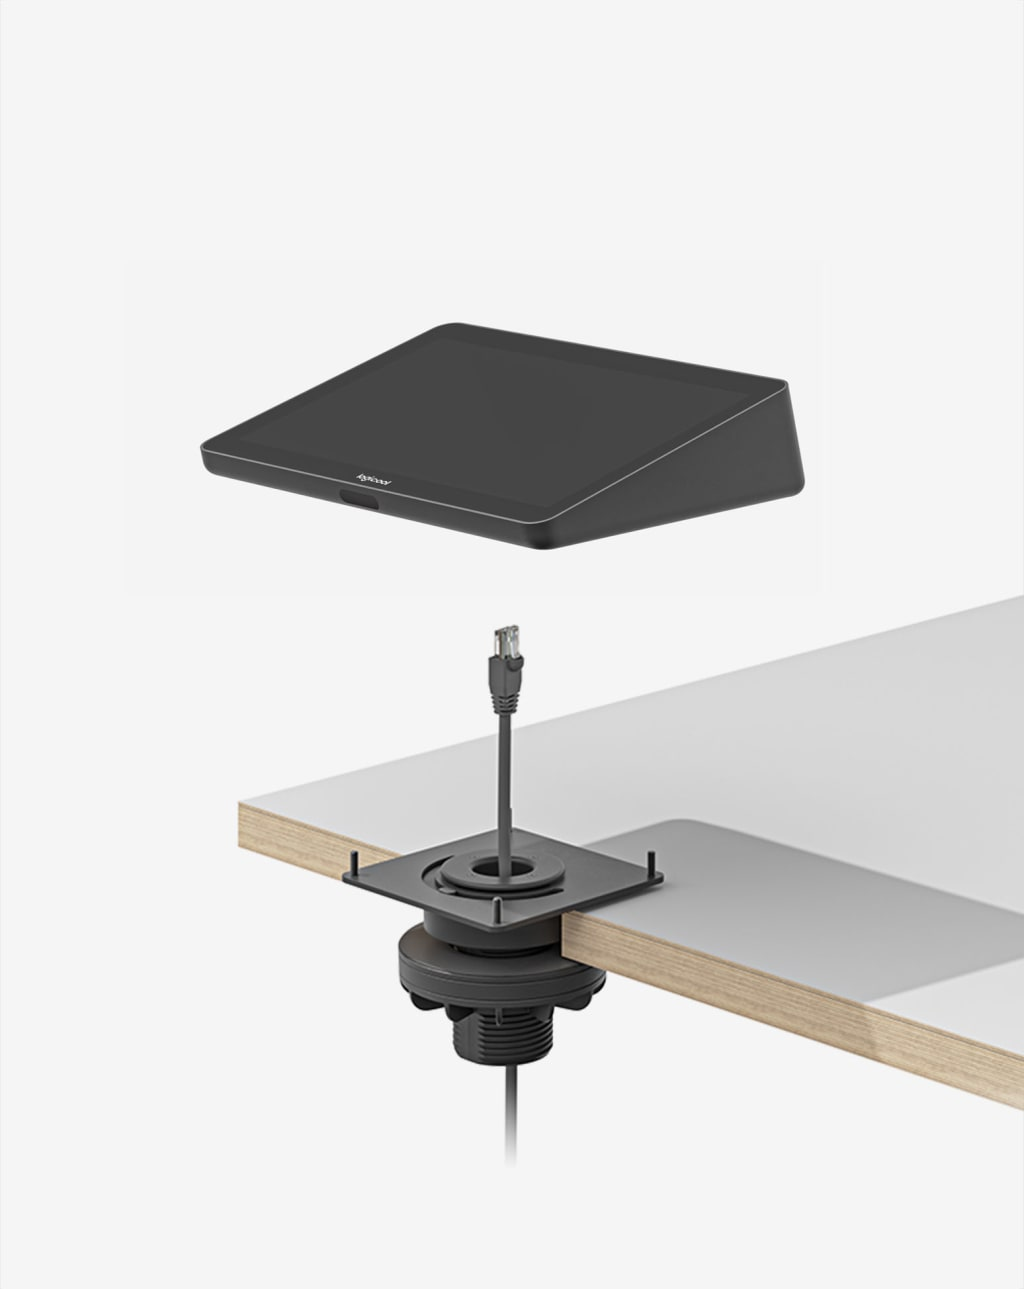 mounts-1-tablet